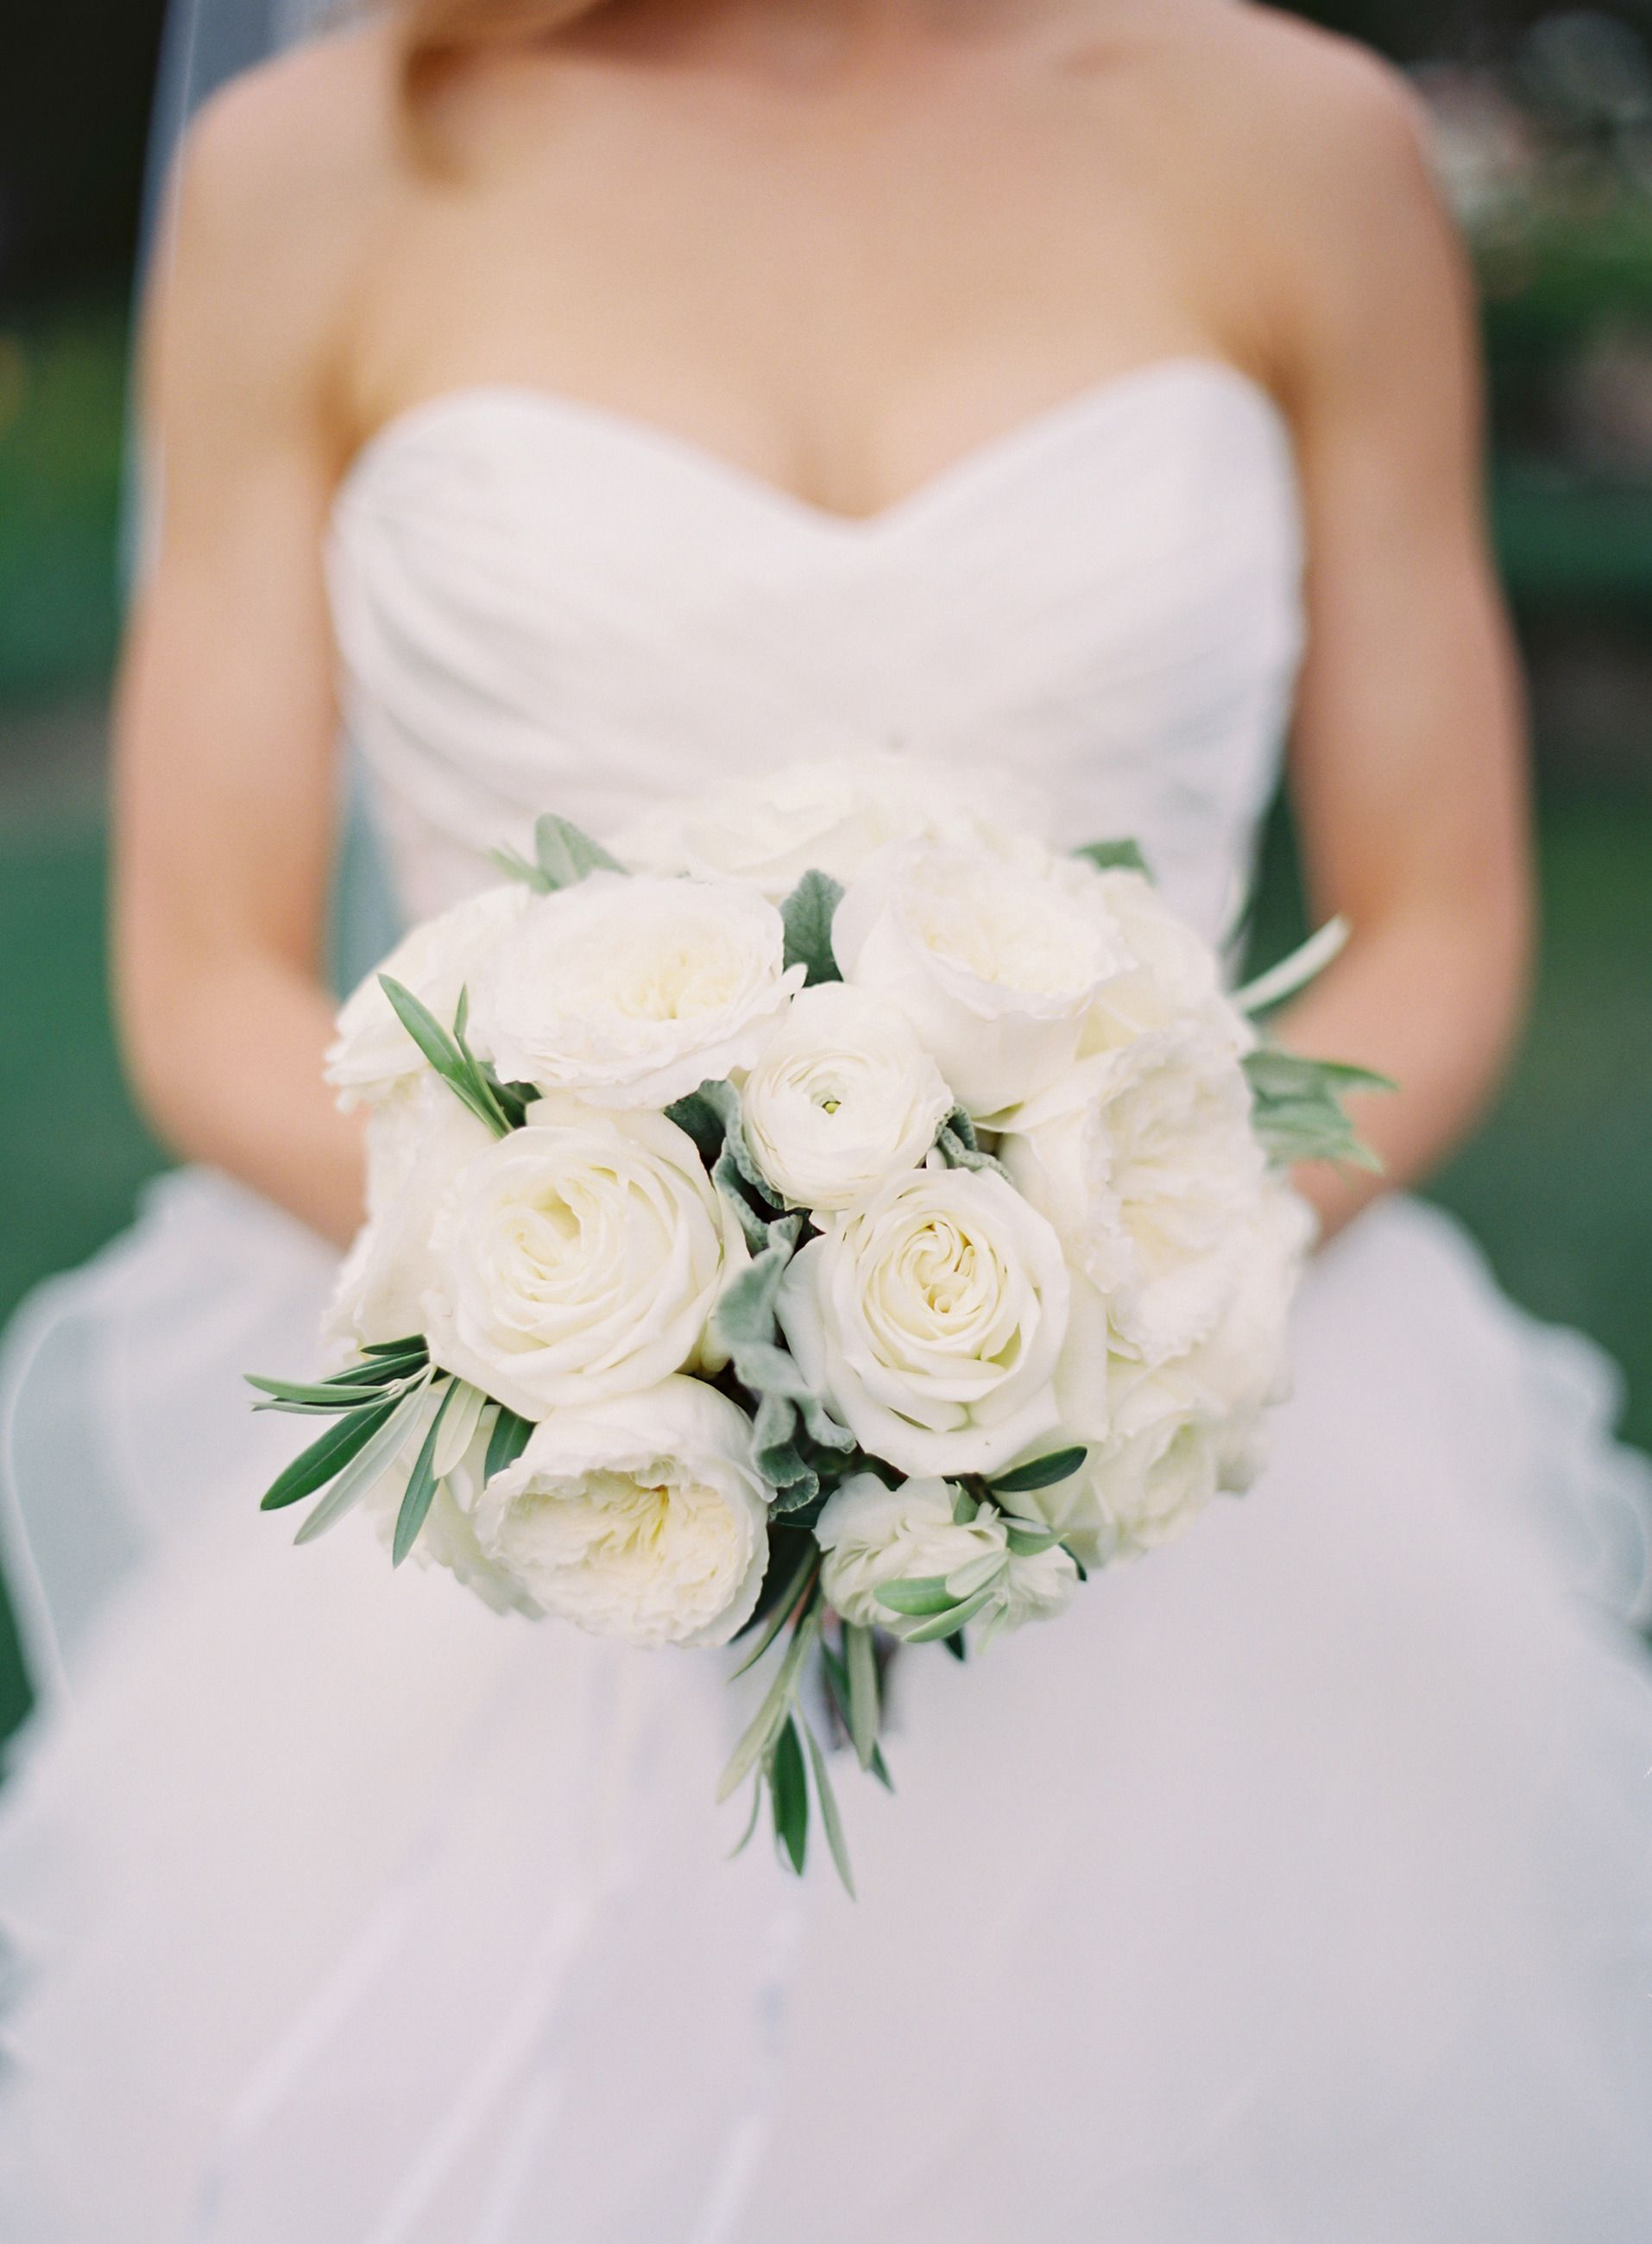 photography the great romance photo thegreatromancephotocom read more http white rose bouquetwhite